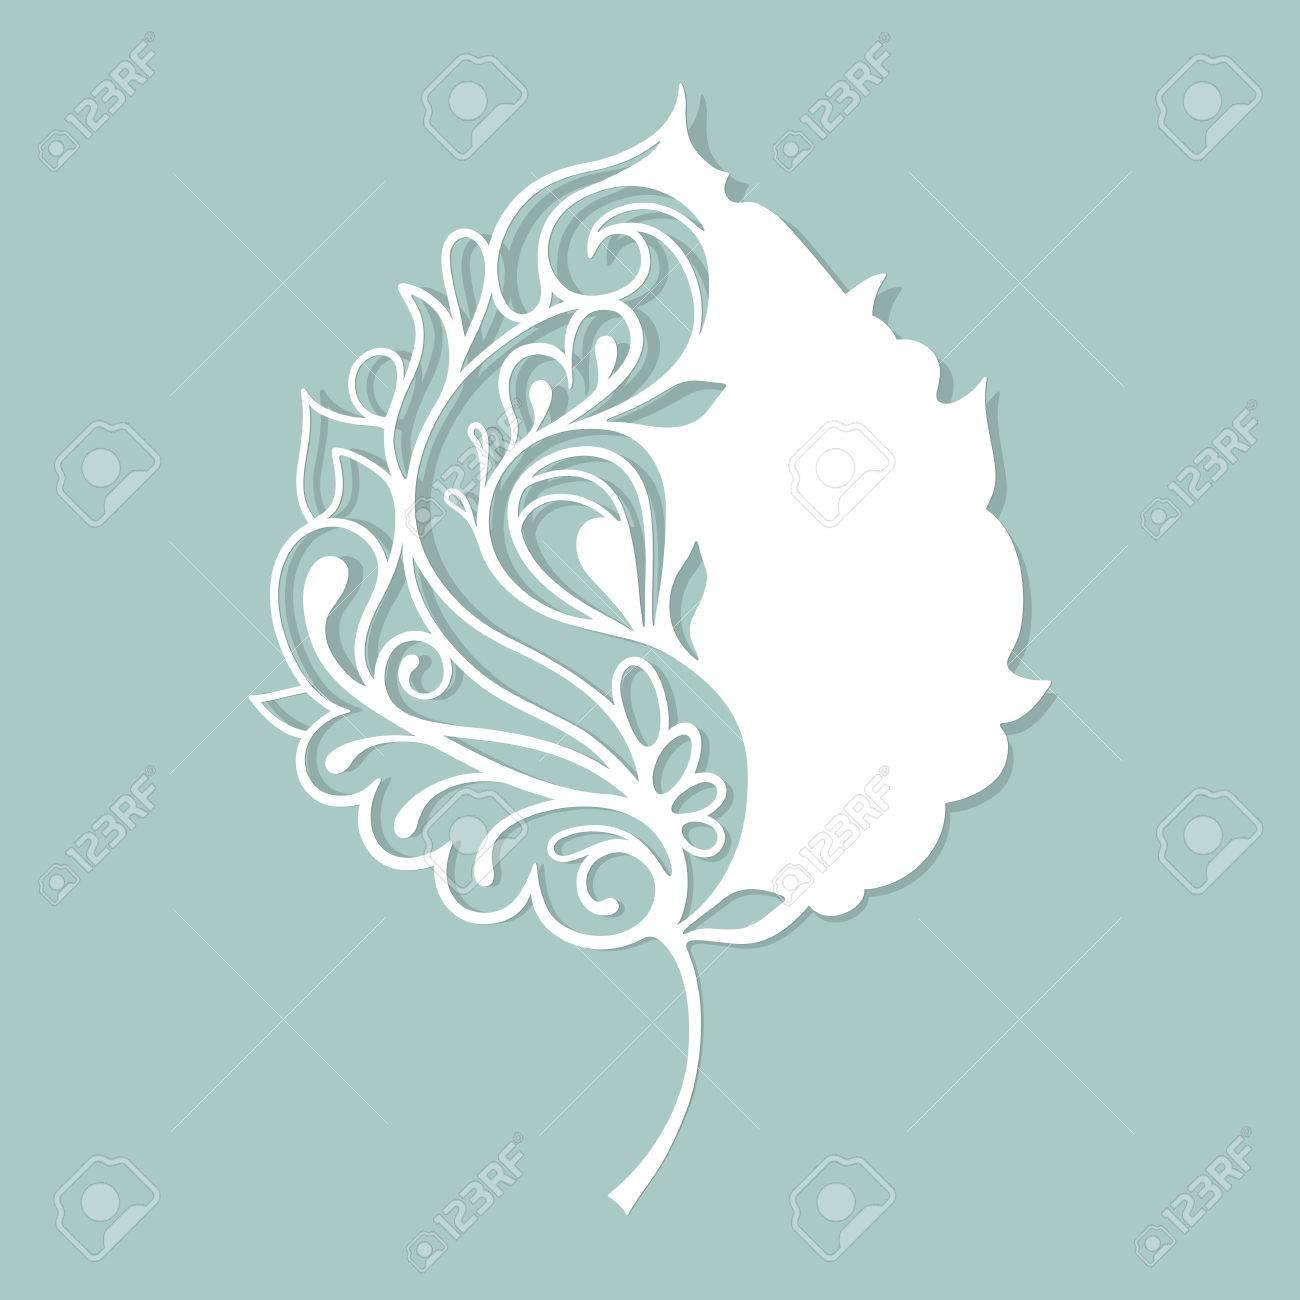 White leaf made of paper. Stylized skeleton leaf. - 50021830